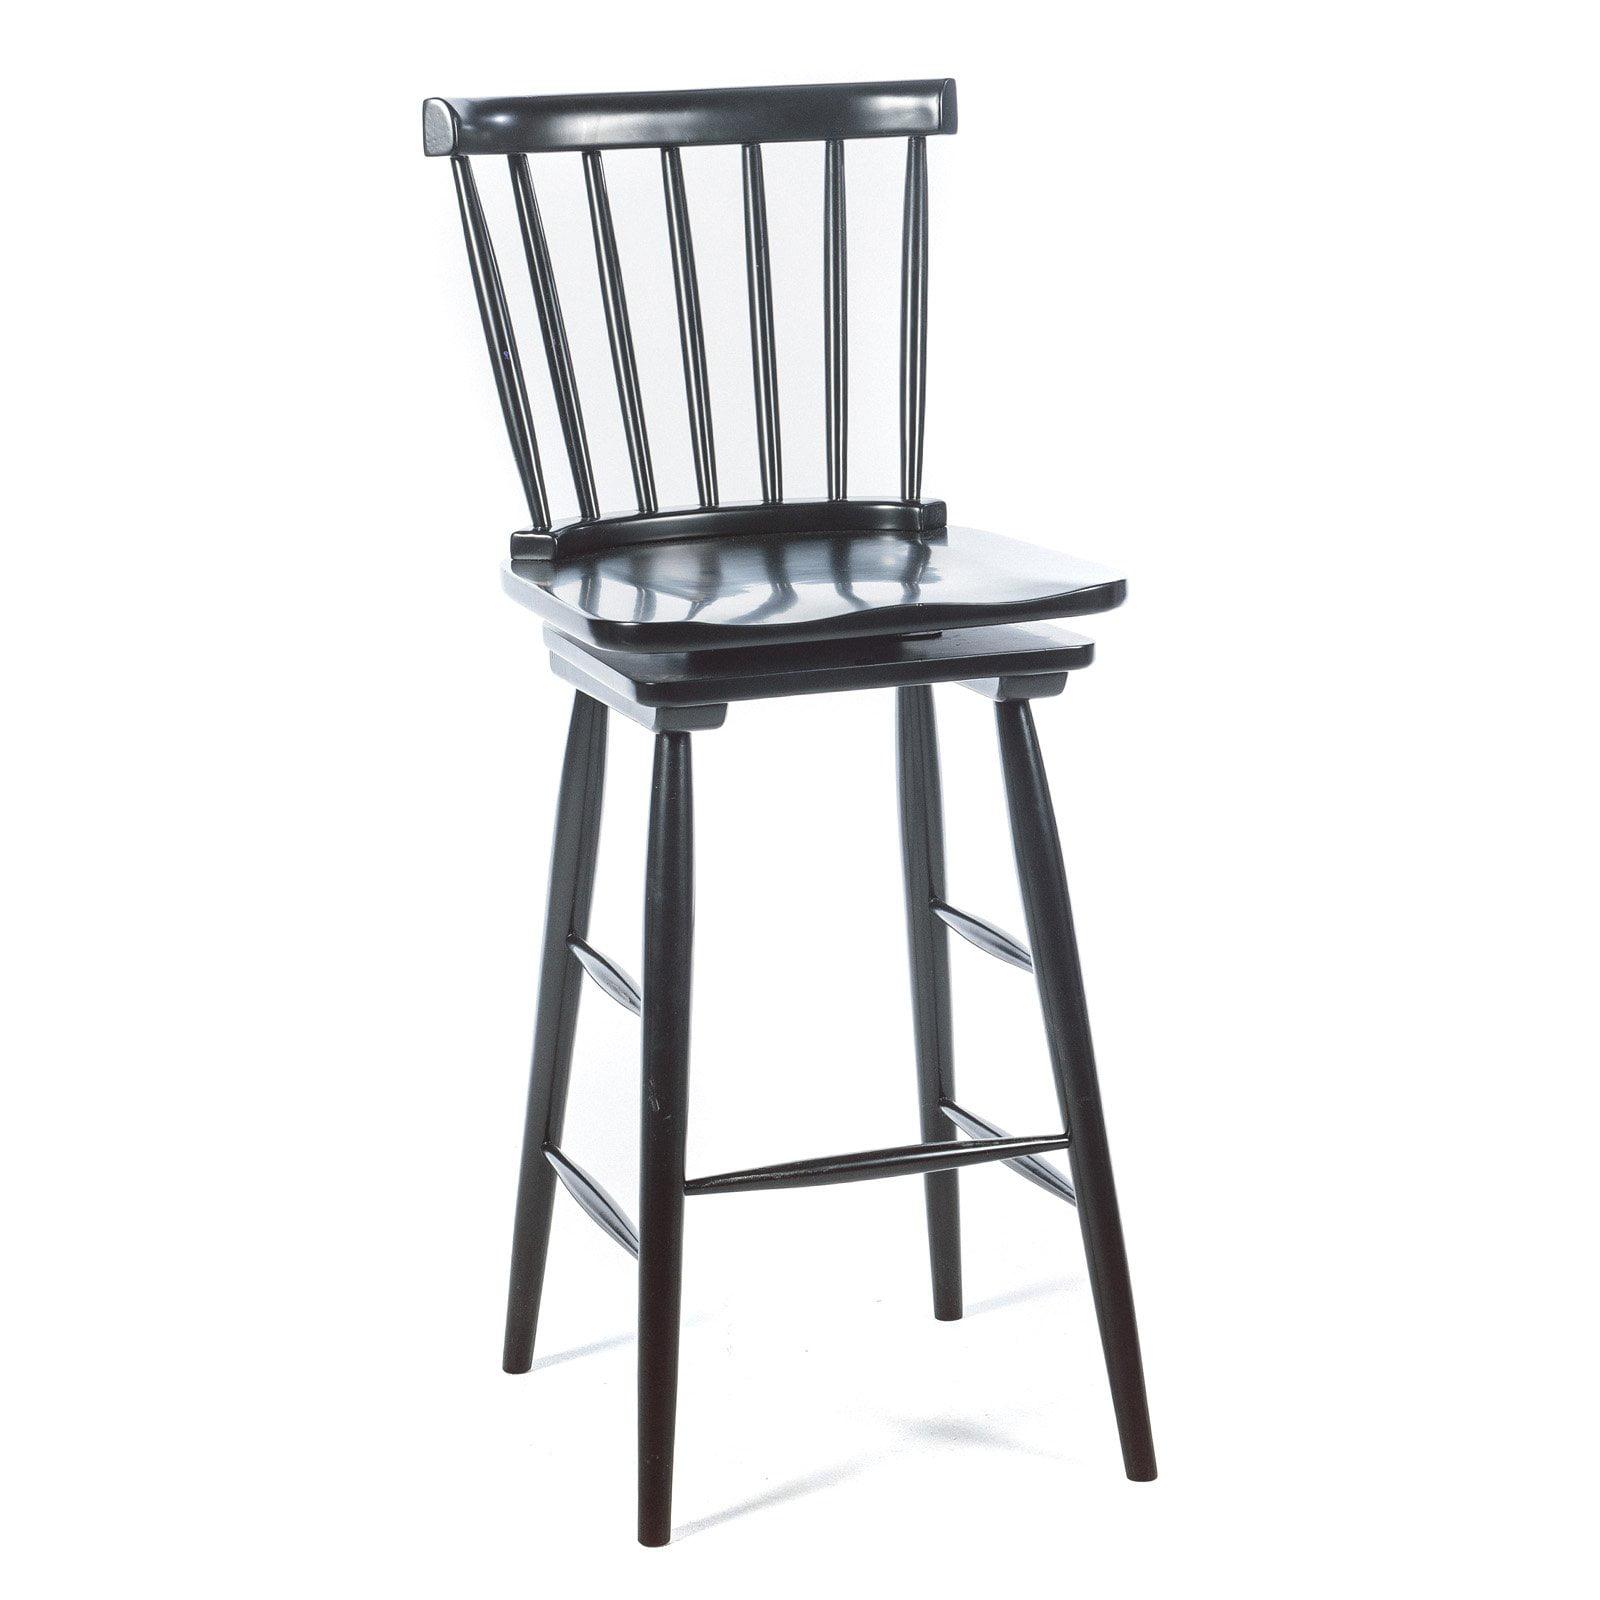 Wondrous Belham Living Windsor Swivel Bar Stool Pabps2019 Chair Design Images Pabps2019Com